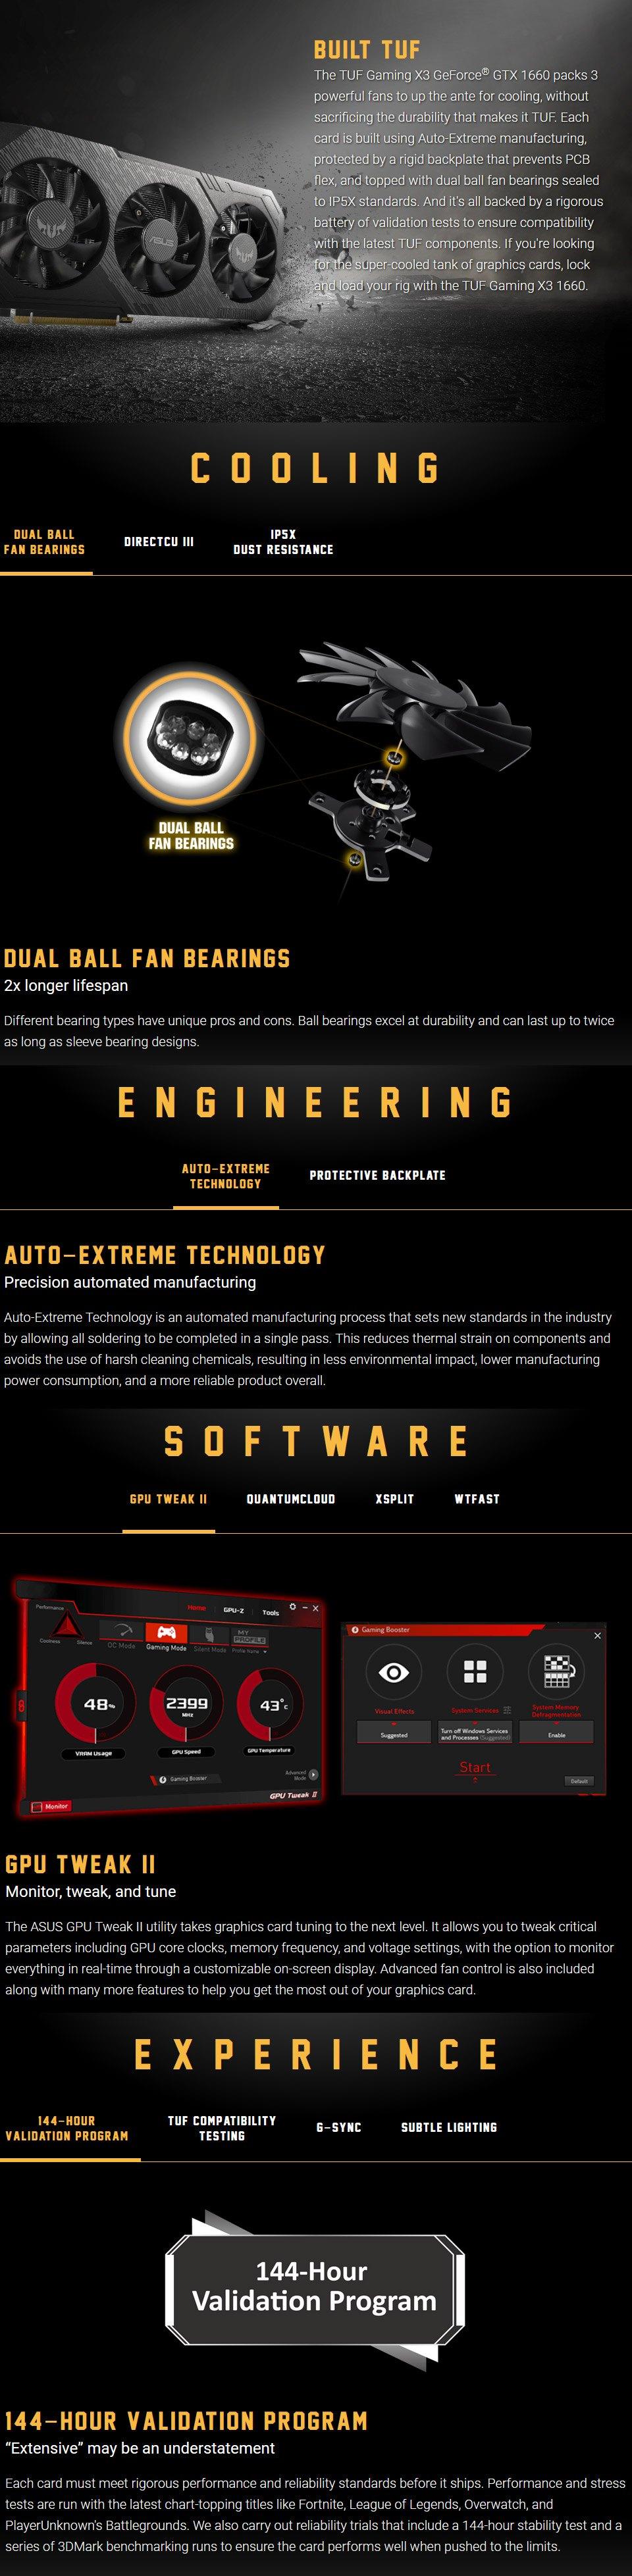 ASUS GeForce GTX 1660 TUF Gaming X3 6GB features